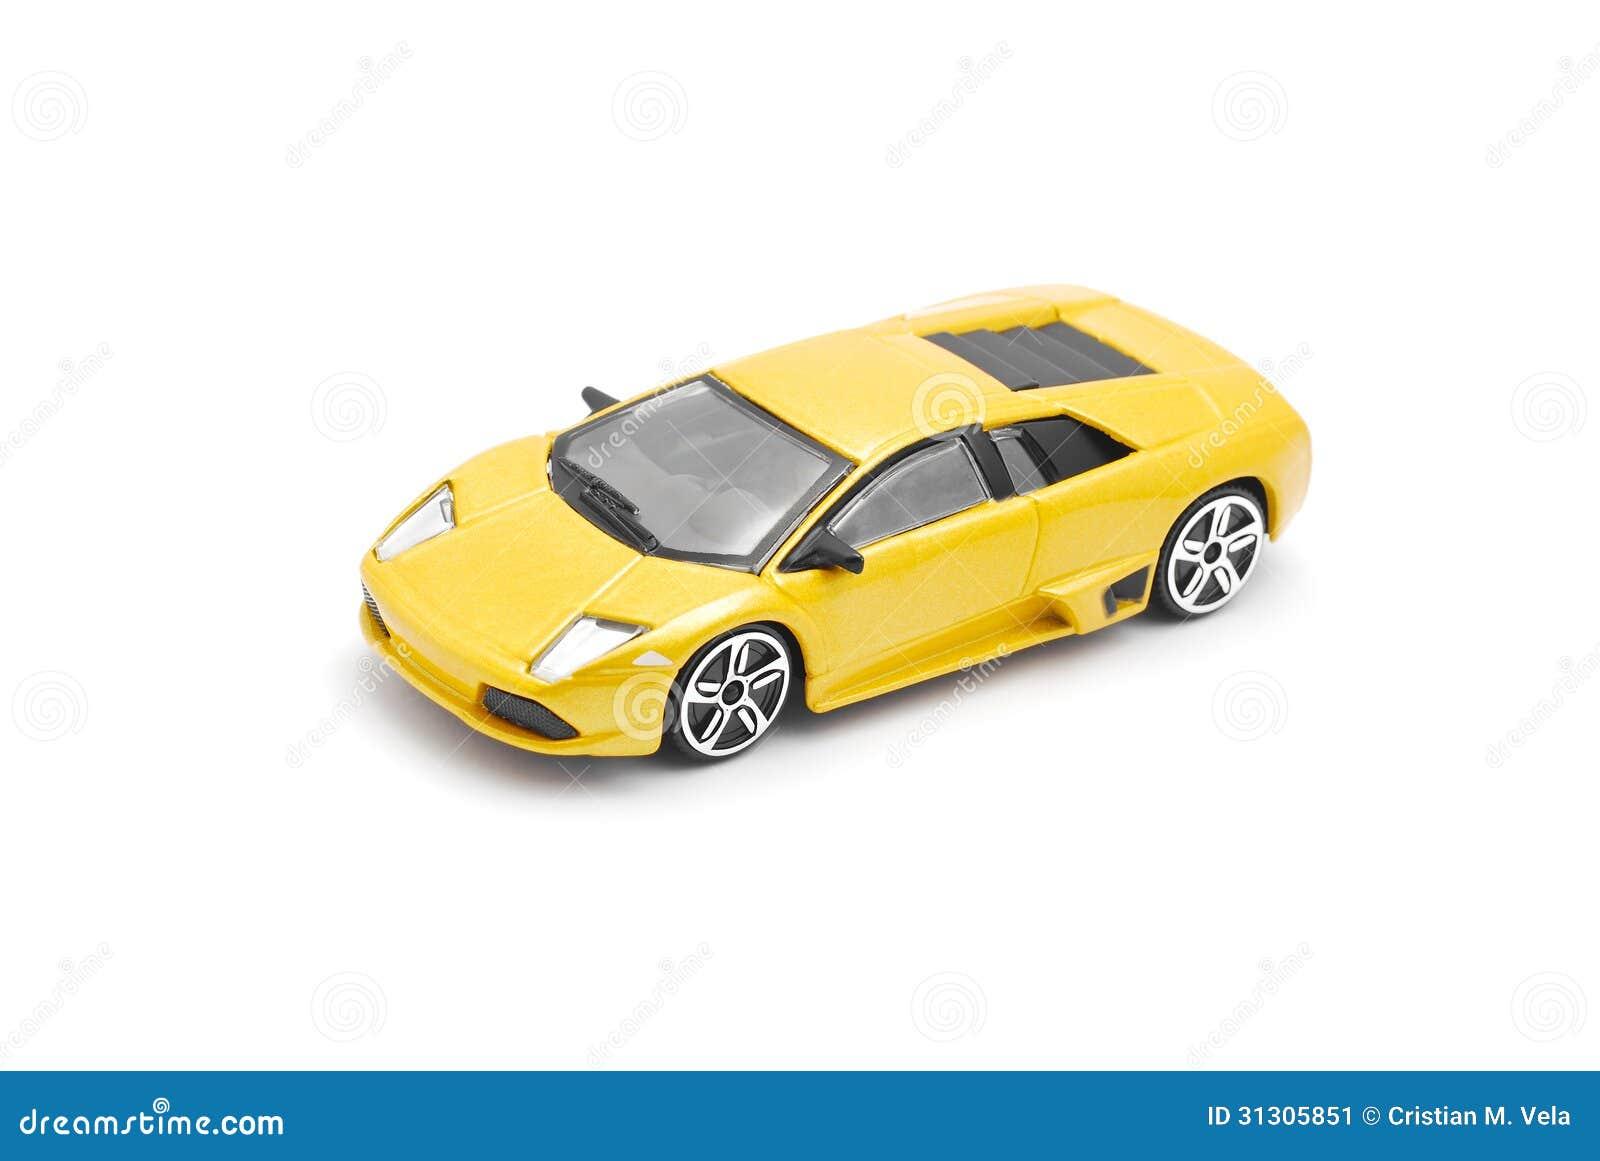 plan toys sports car black ametuer sex. Black Bedroom Furniture Sets. Home Design Ideas